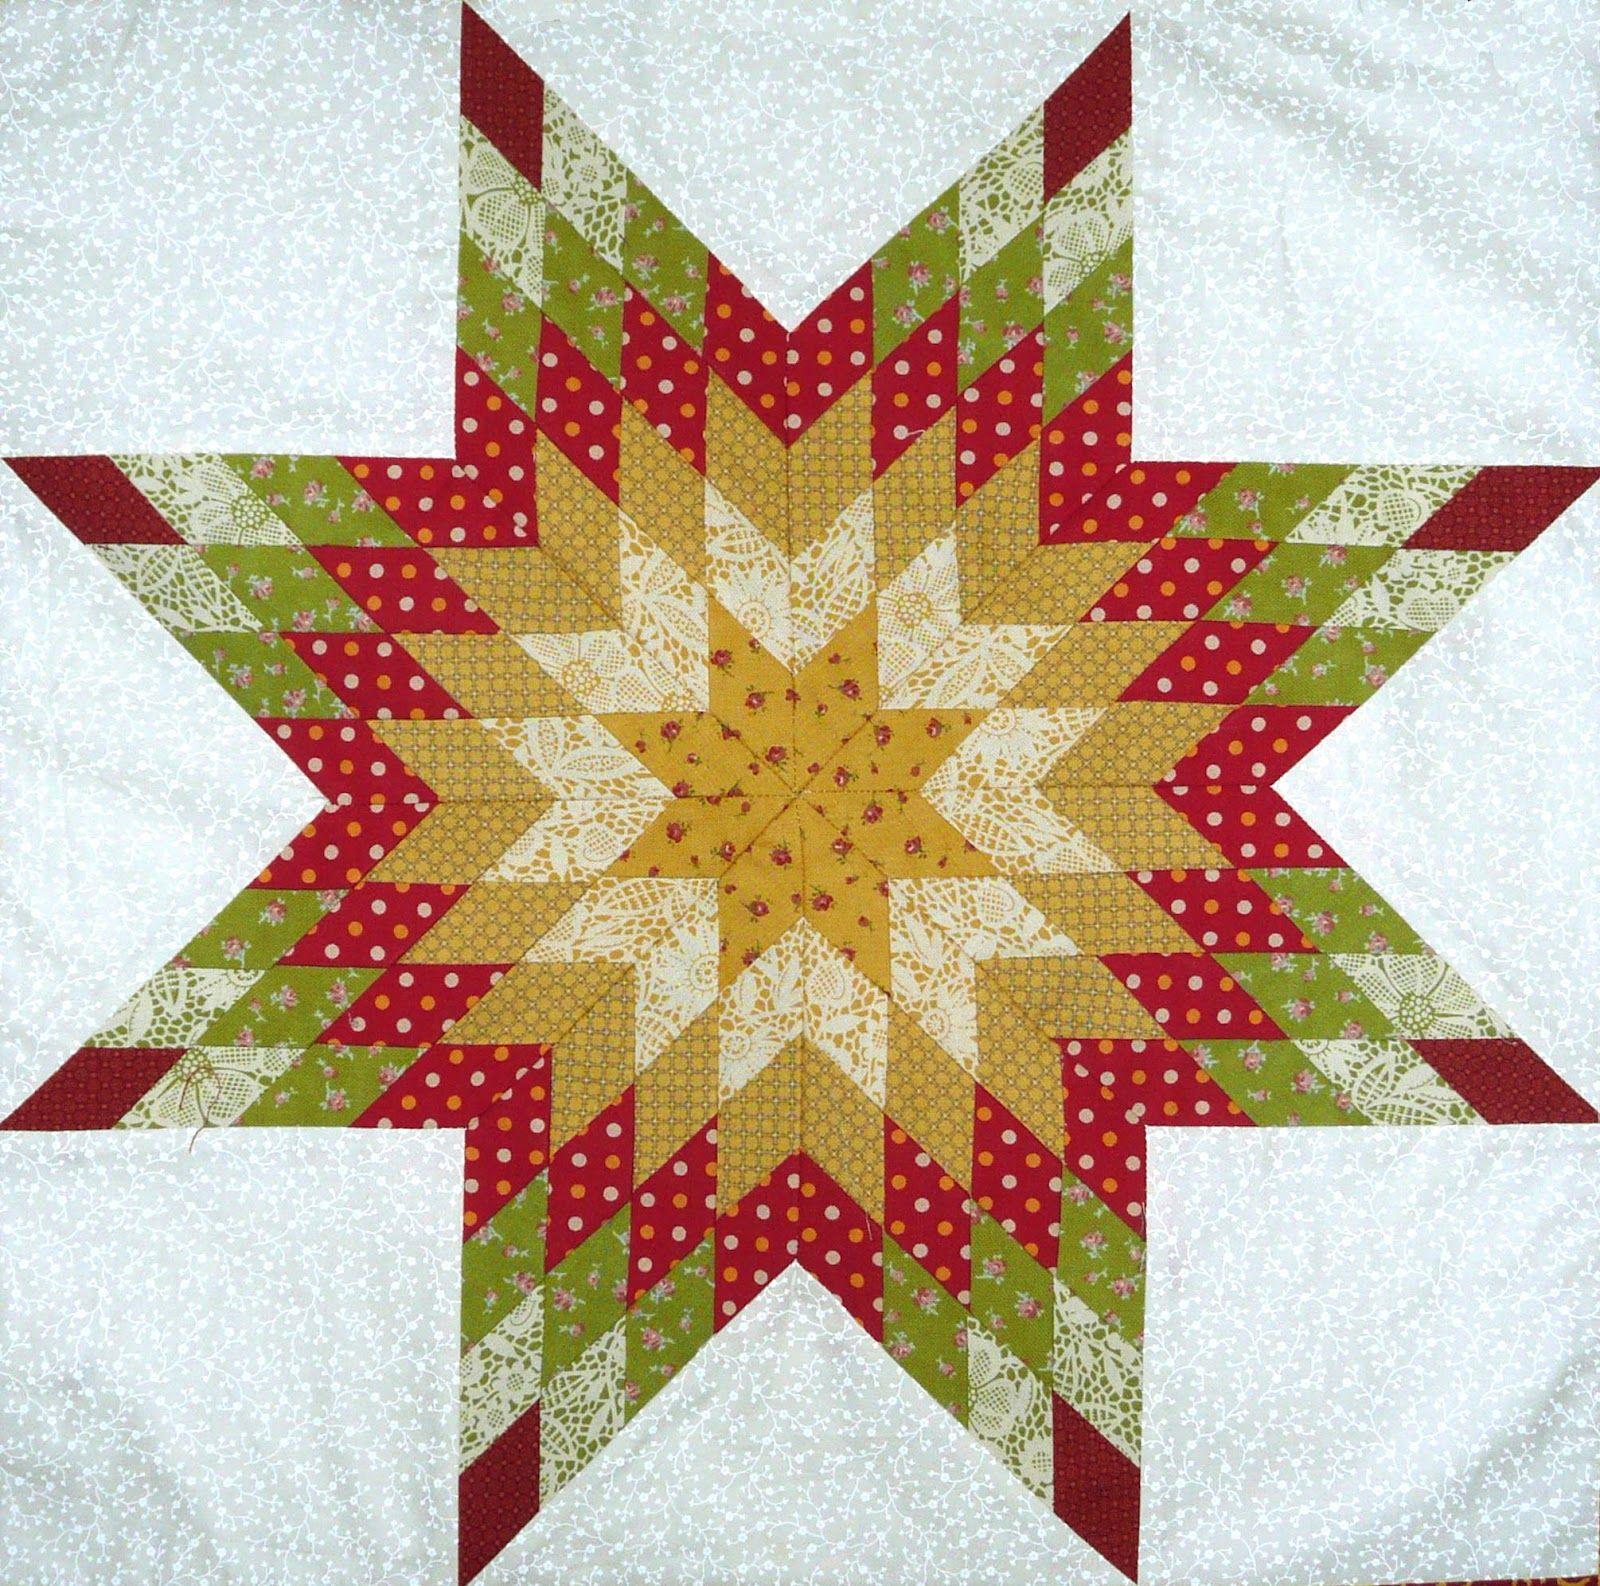 Lone Star Quilt Pattern Free Printable - Bing Images   Quilts - Quilt Patterns Free Printable